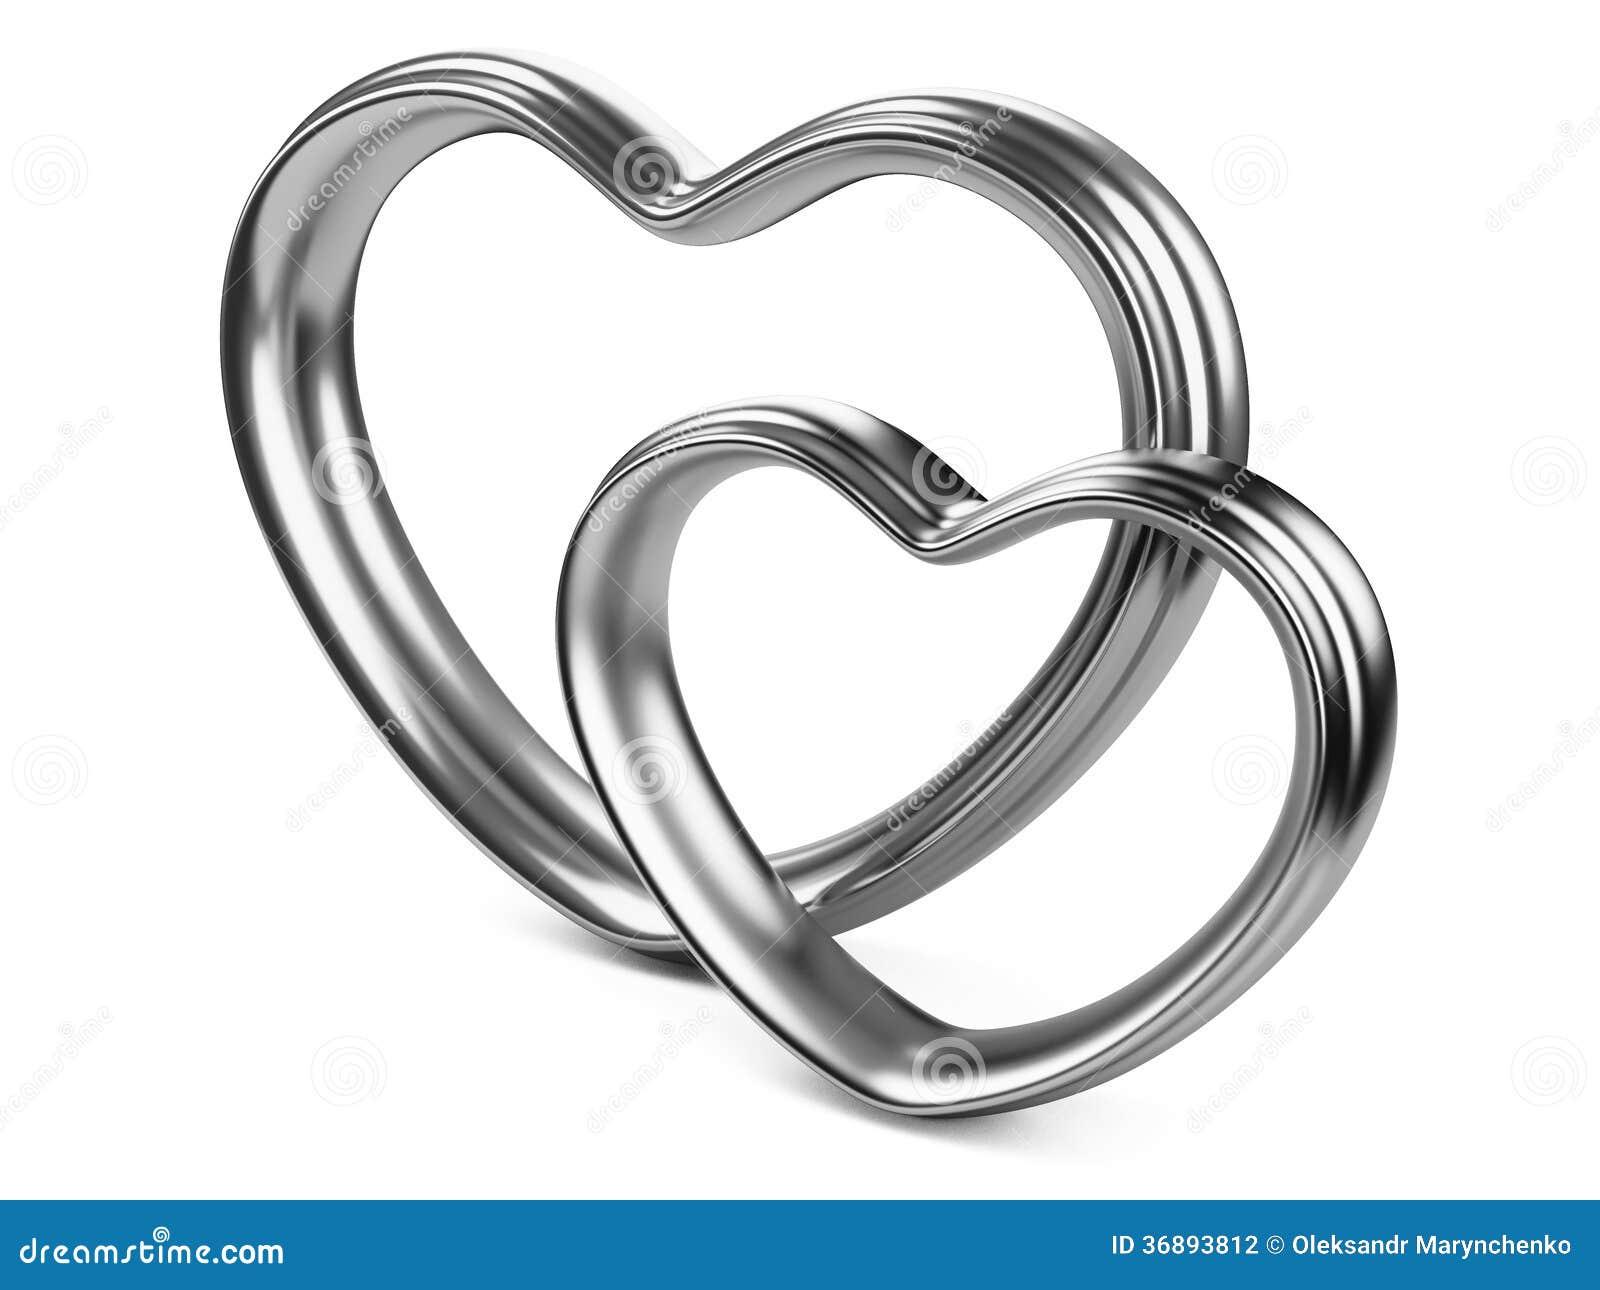 heart in sand clip art